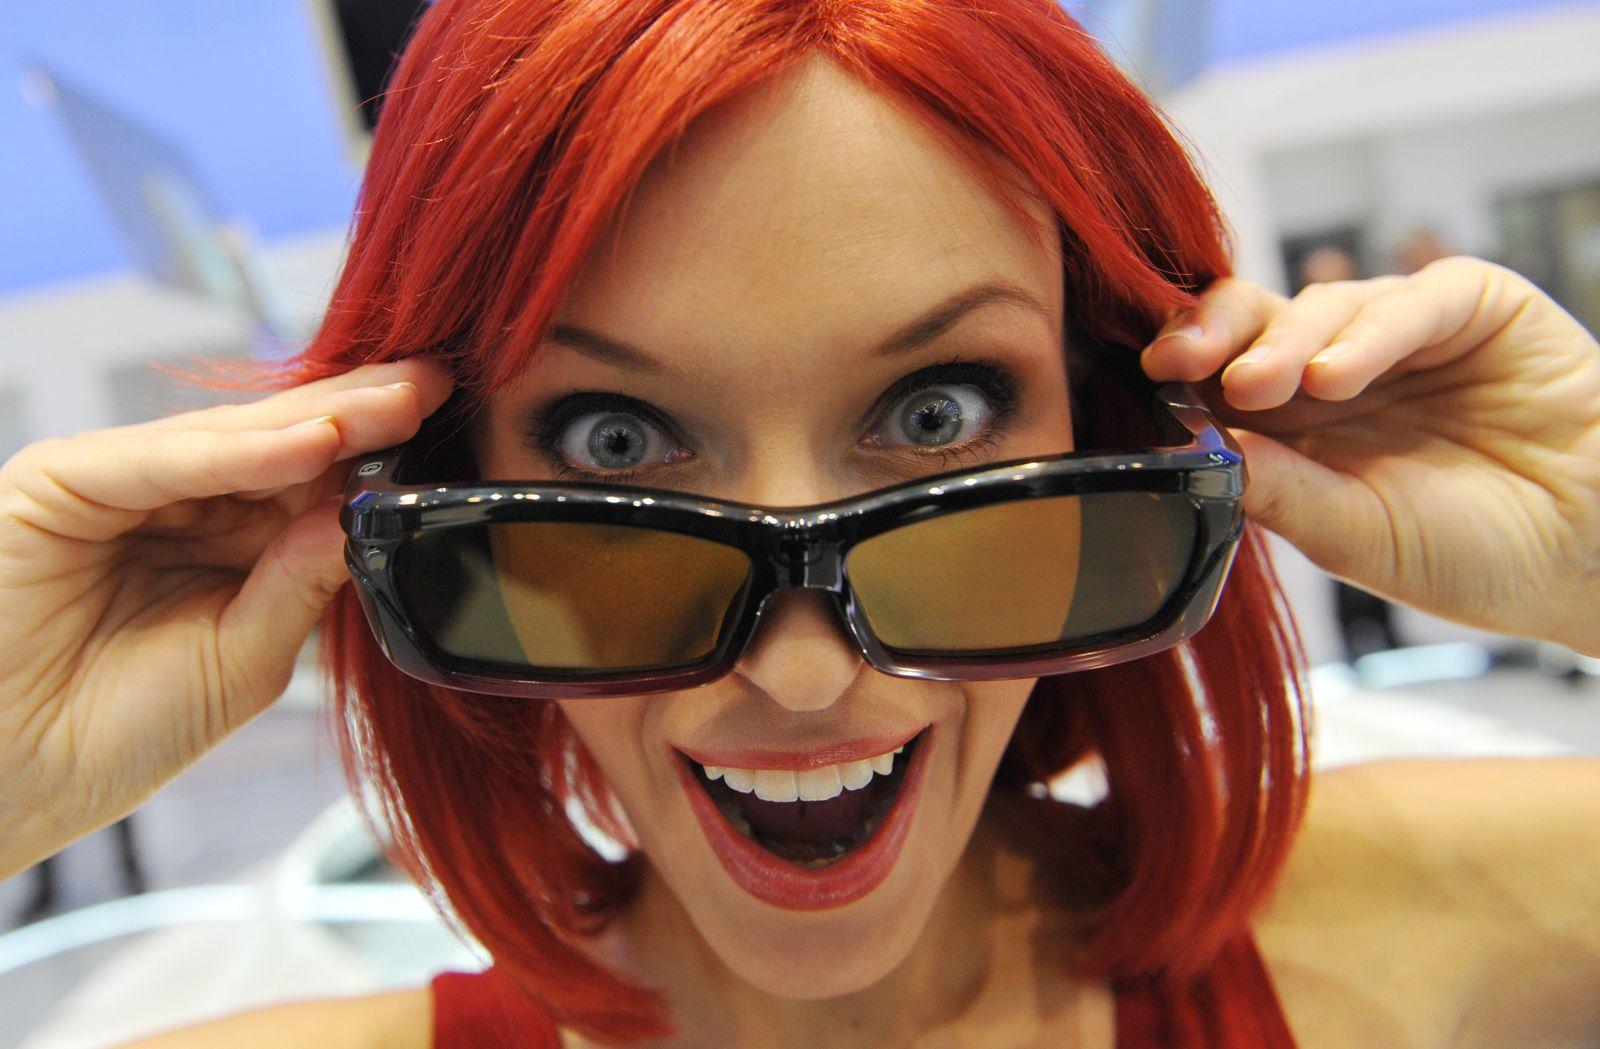 IFA 2010 / Miss IFA / 3D Brille